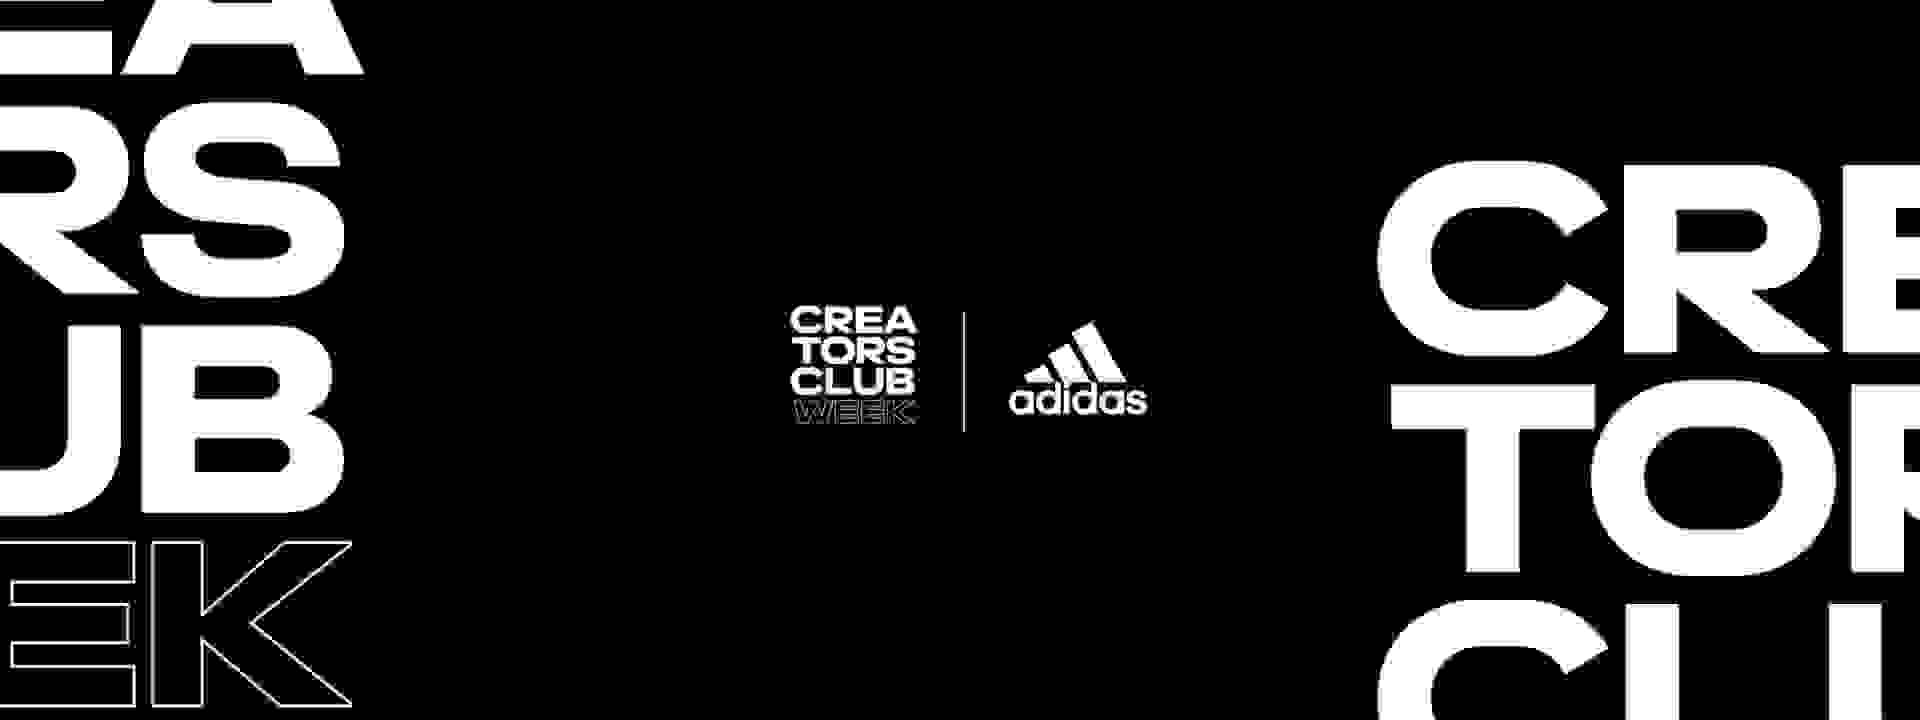 Creatos Club Week Logo on black background.